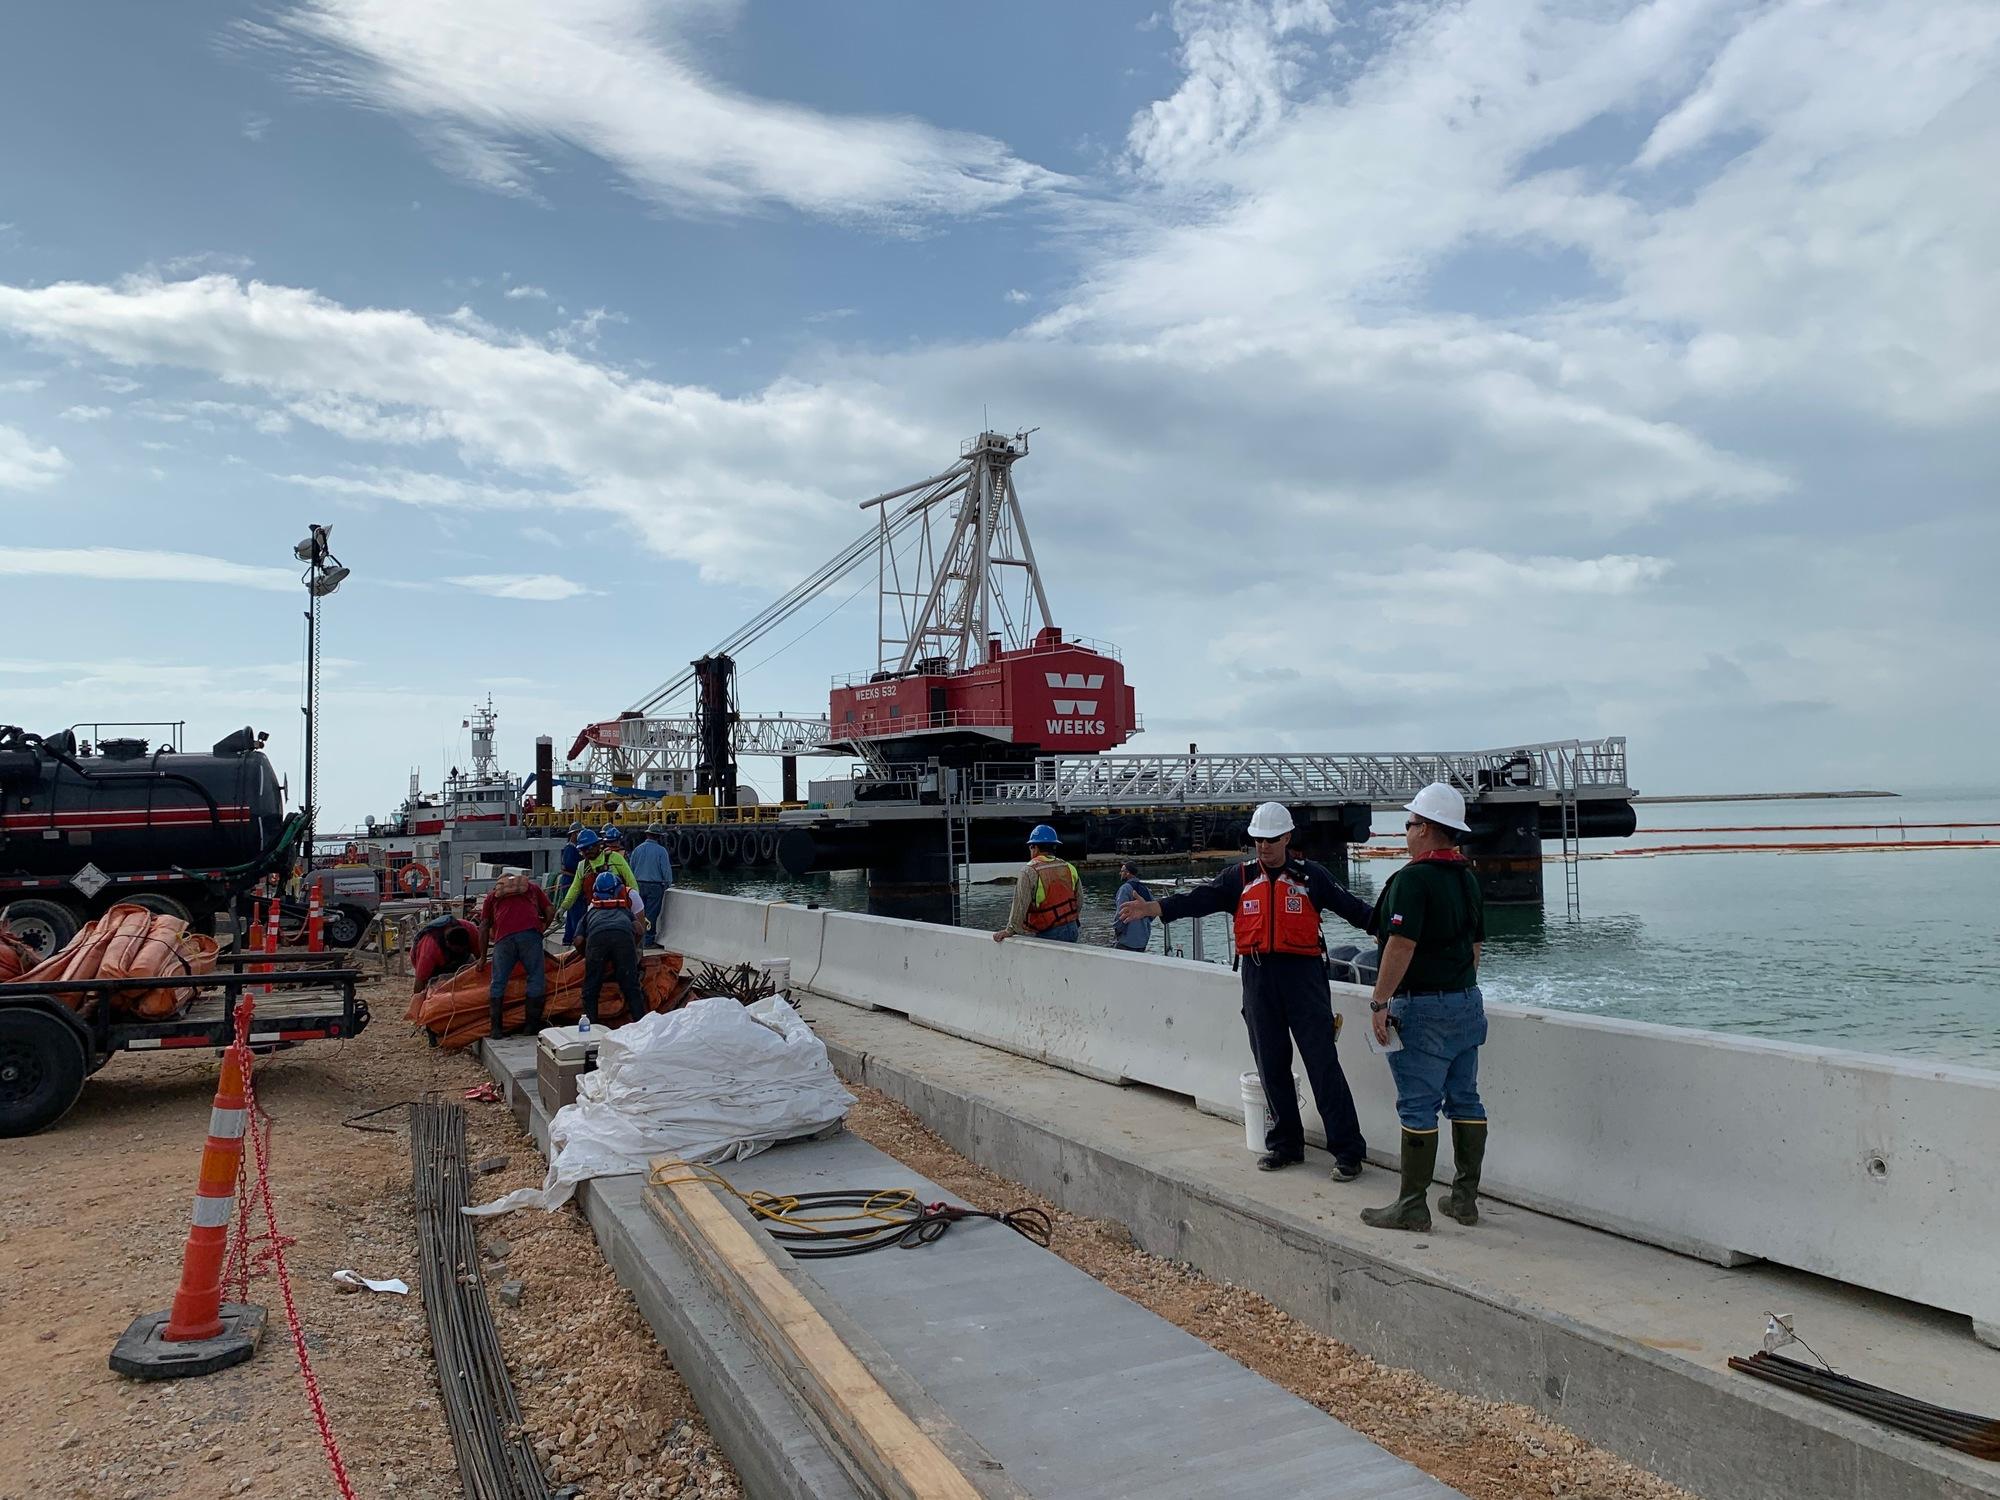 Coast Guard, TGLO responding to hydraulic oil spill near Corpus Christi, Texas